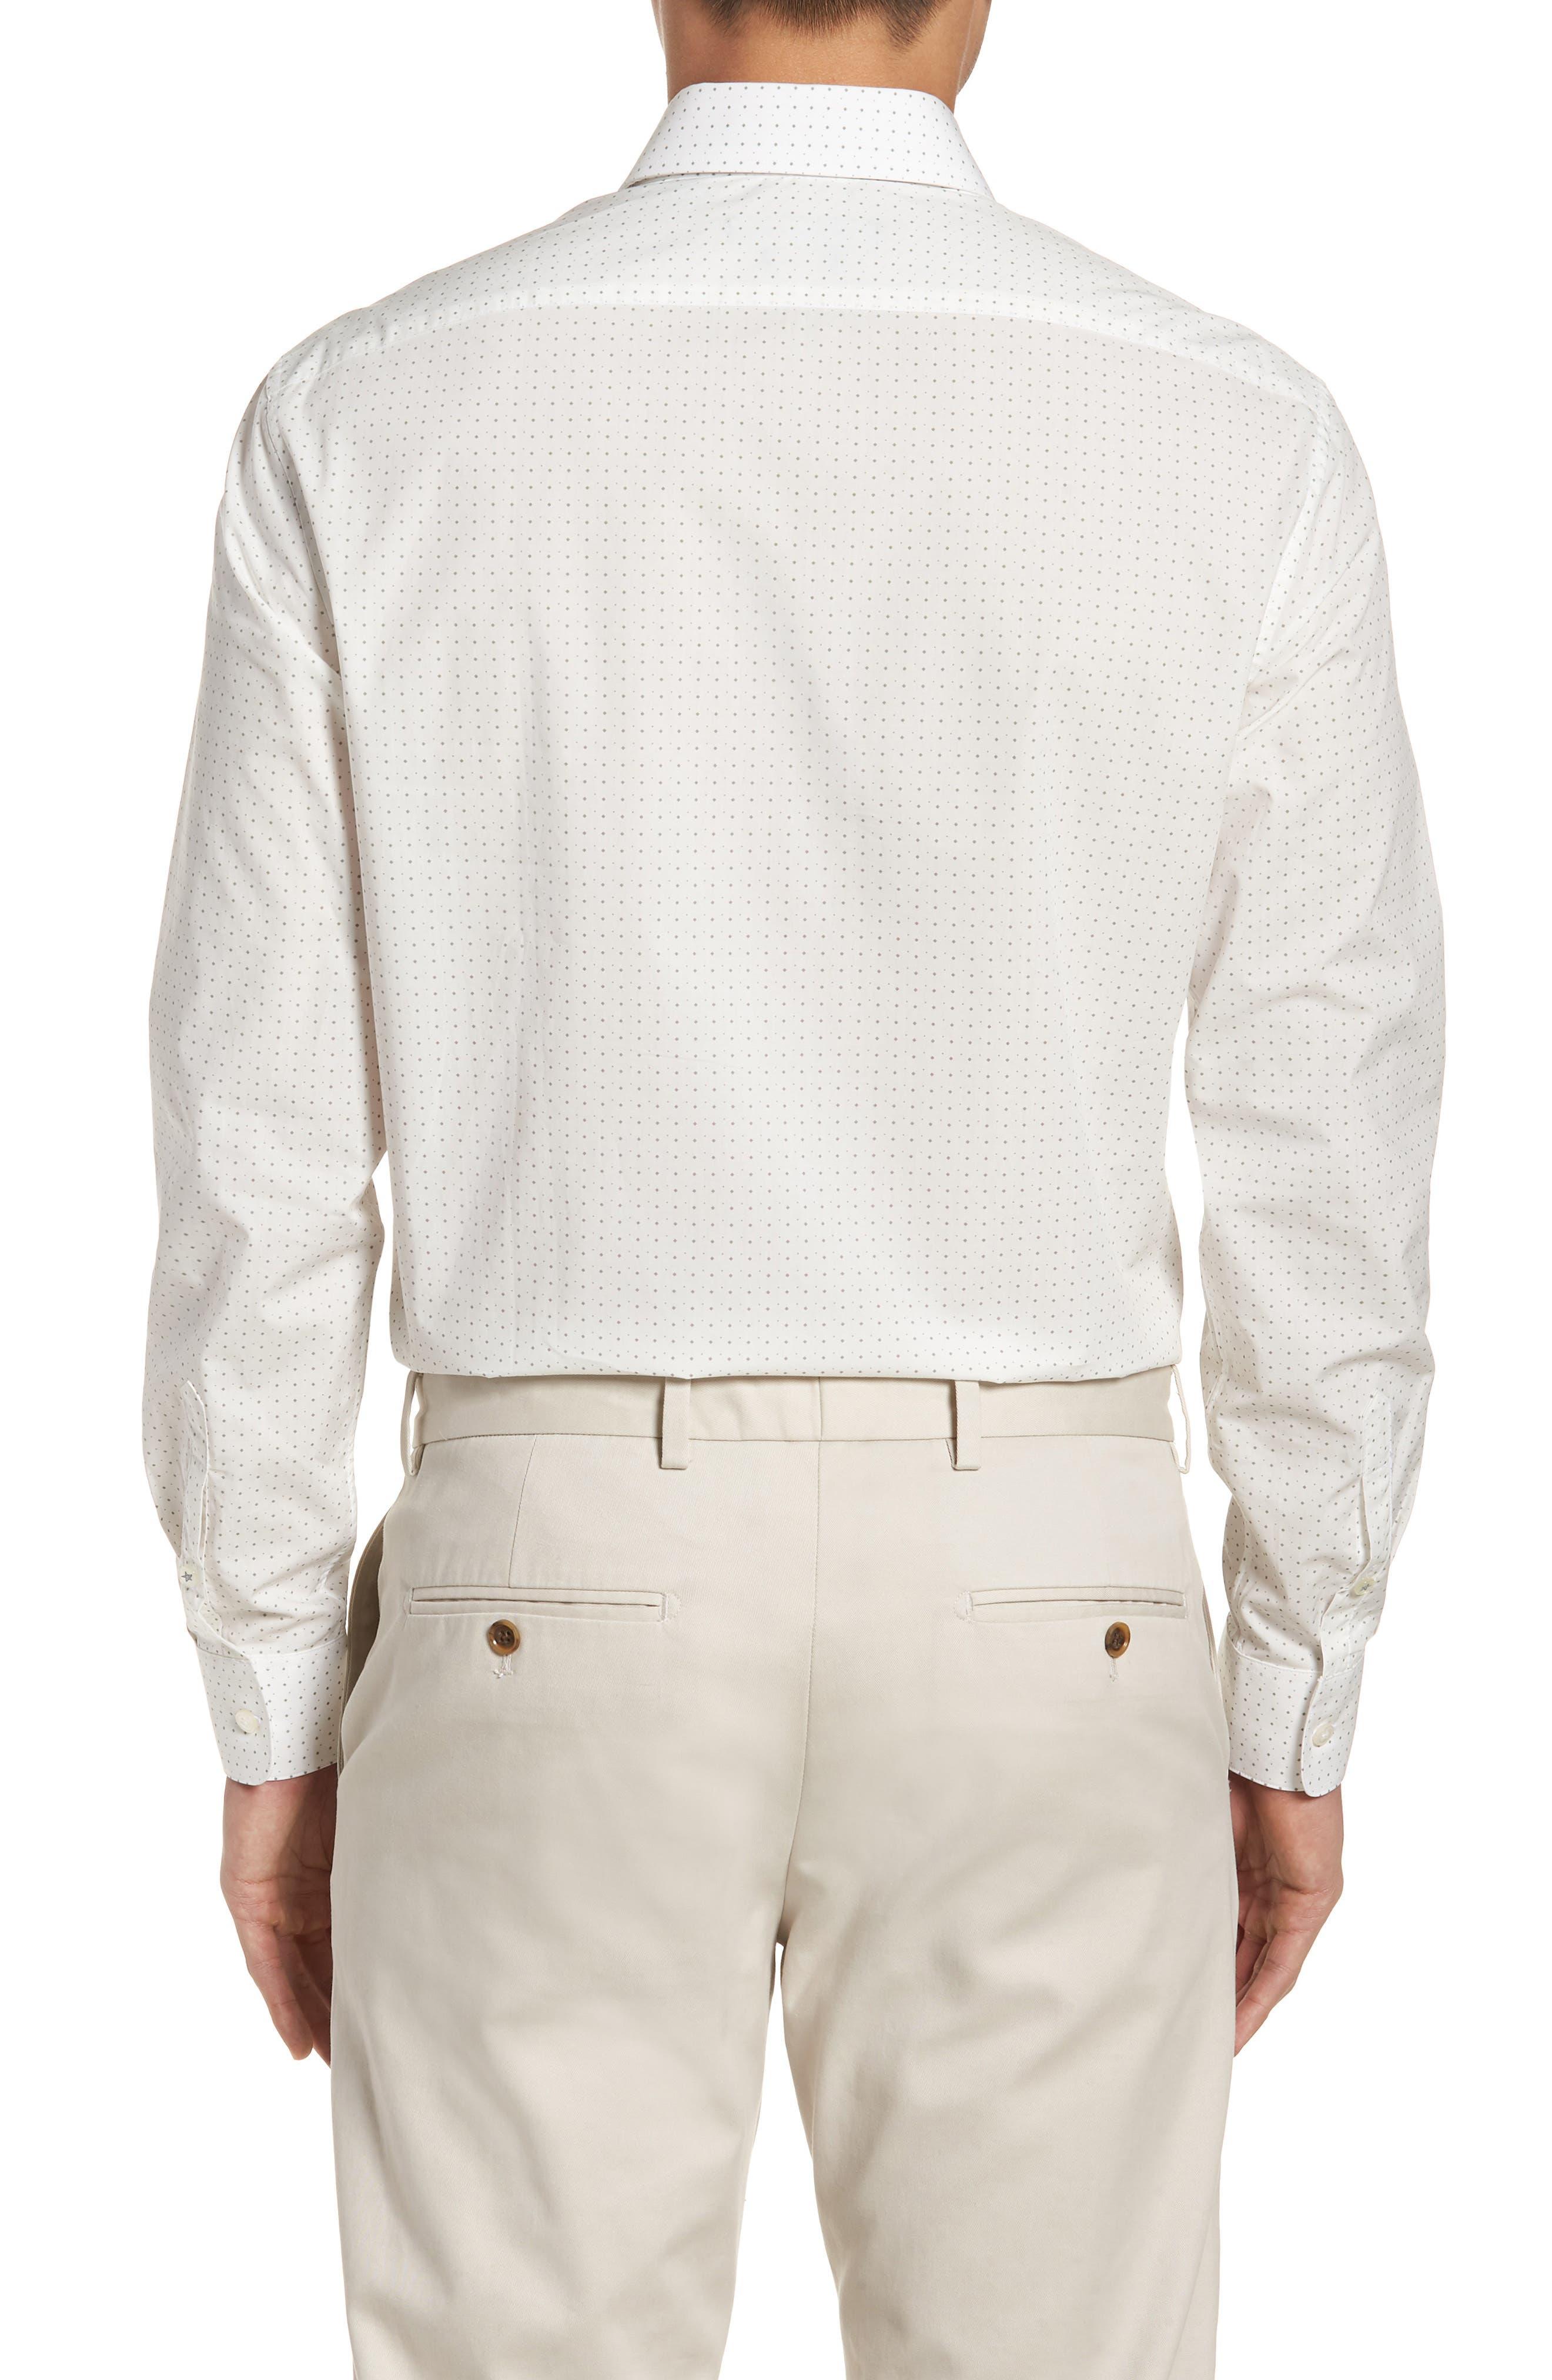 Regular Fit Diamond Dress Shirt,                             Alternate thumbnail 3, color,                             077